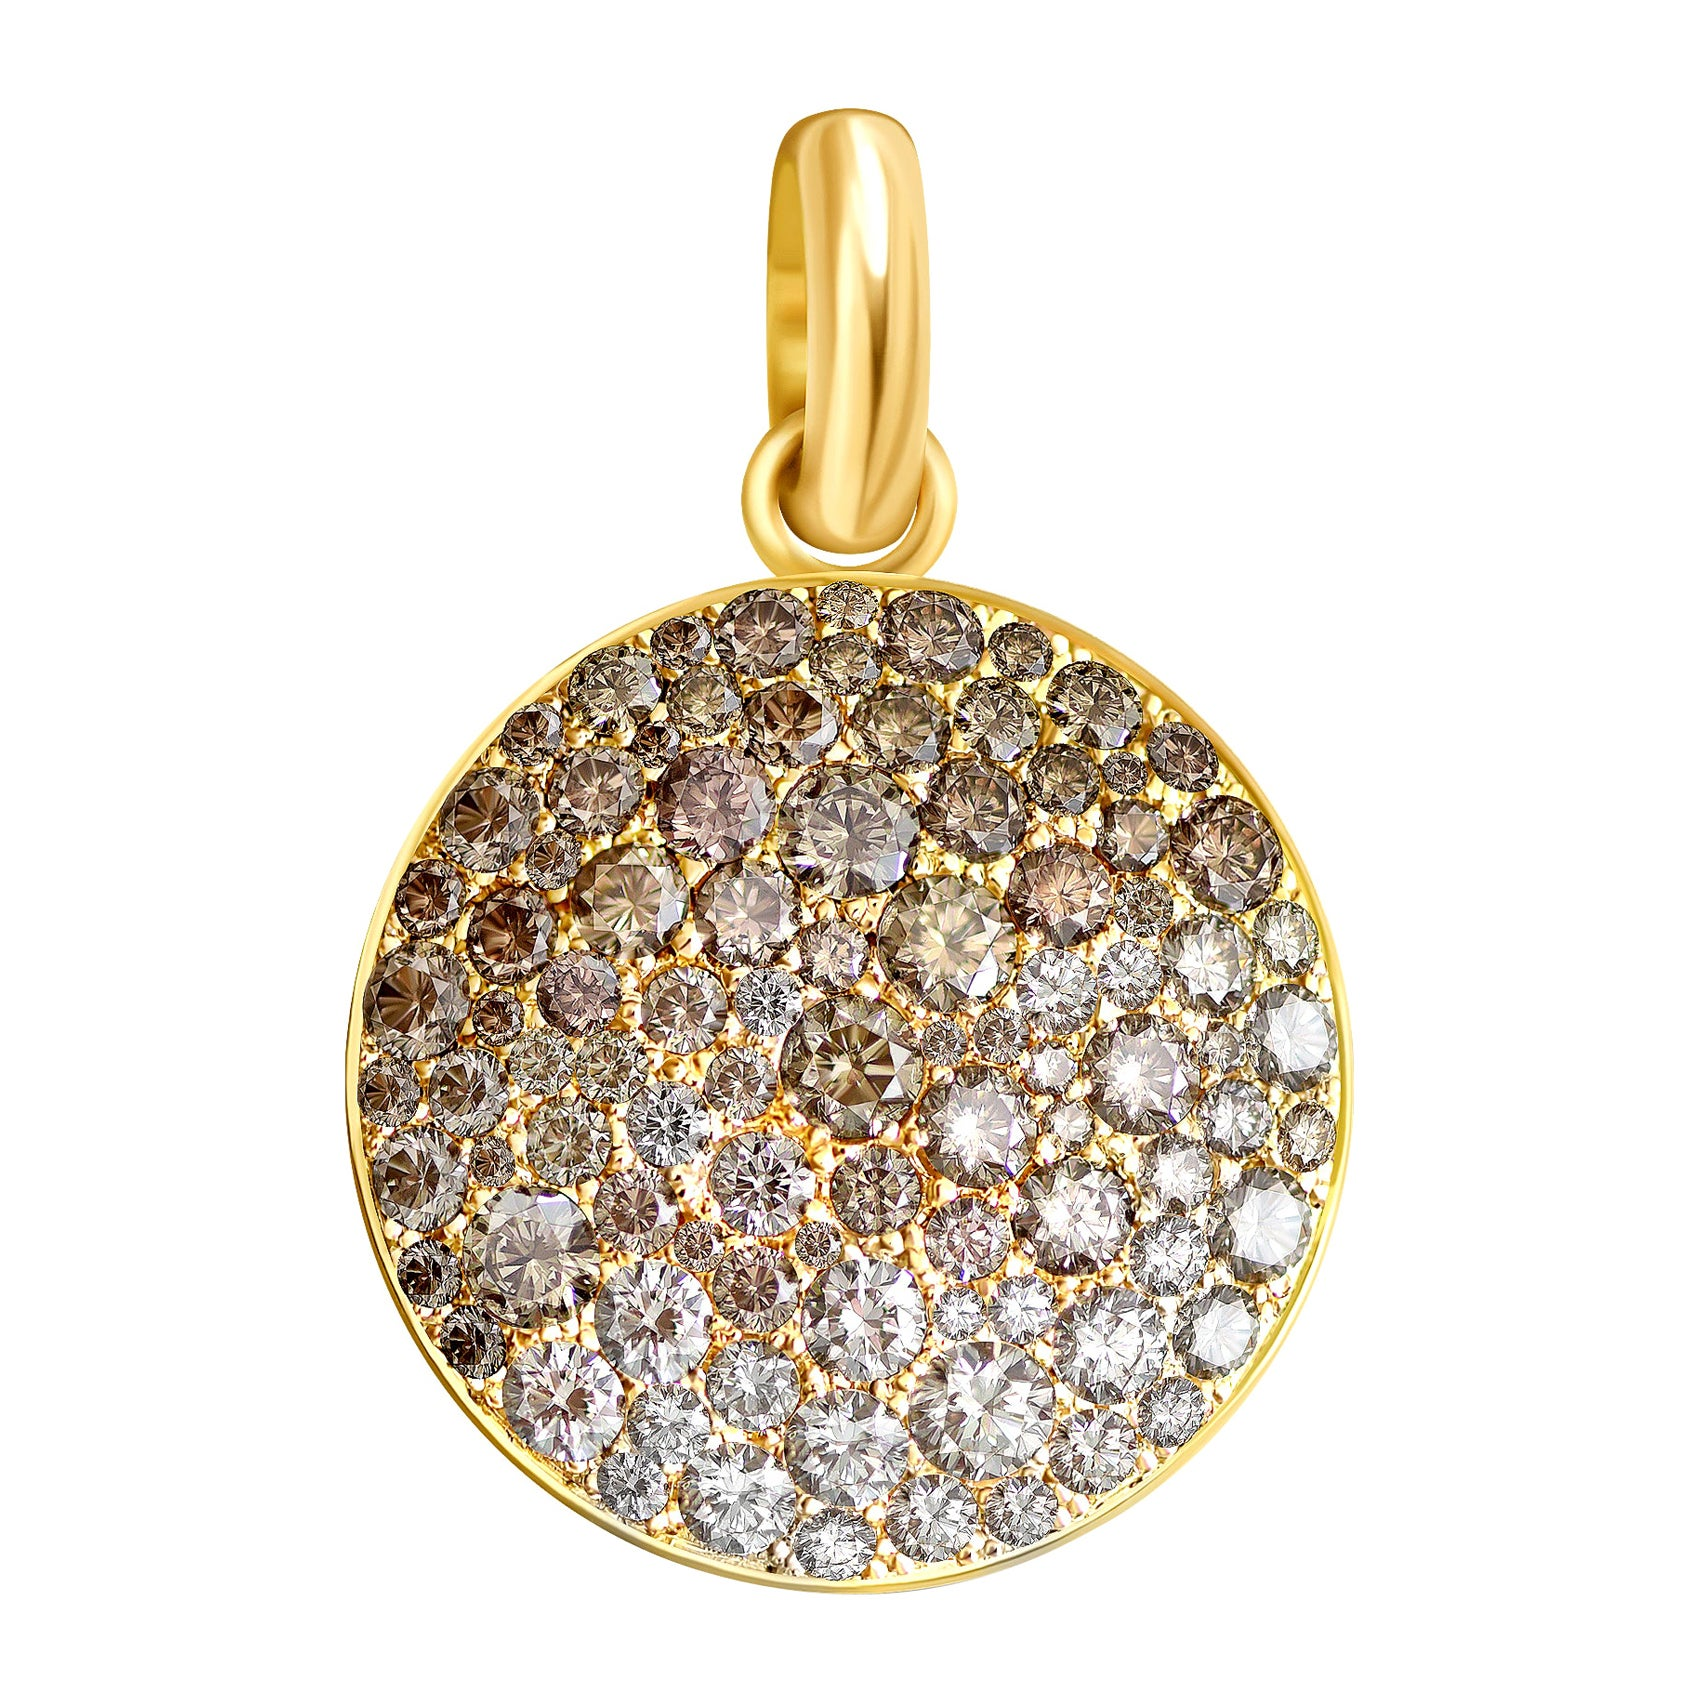 4 Carat Champagne and White Diamonds pave 14 Karat Yellow Gold Pendant